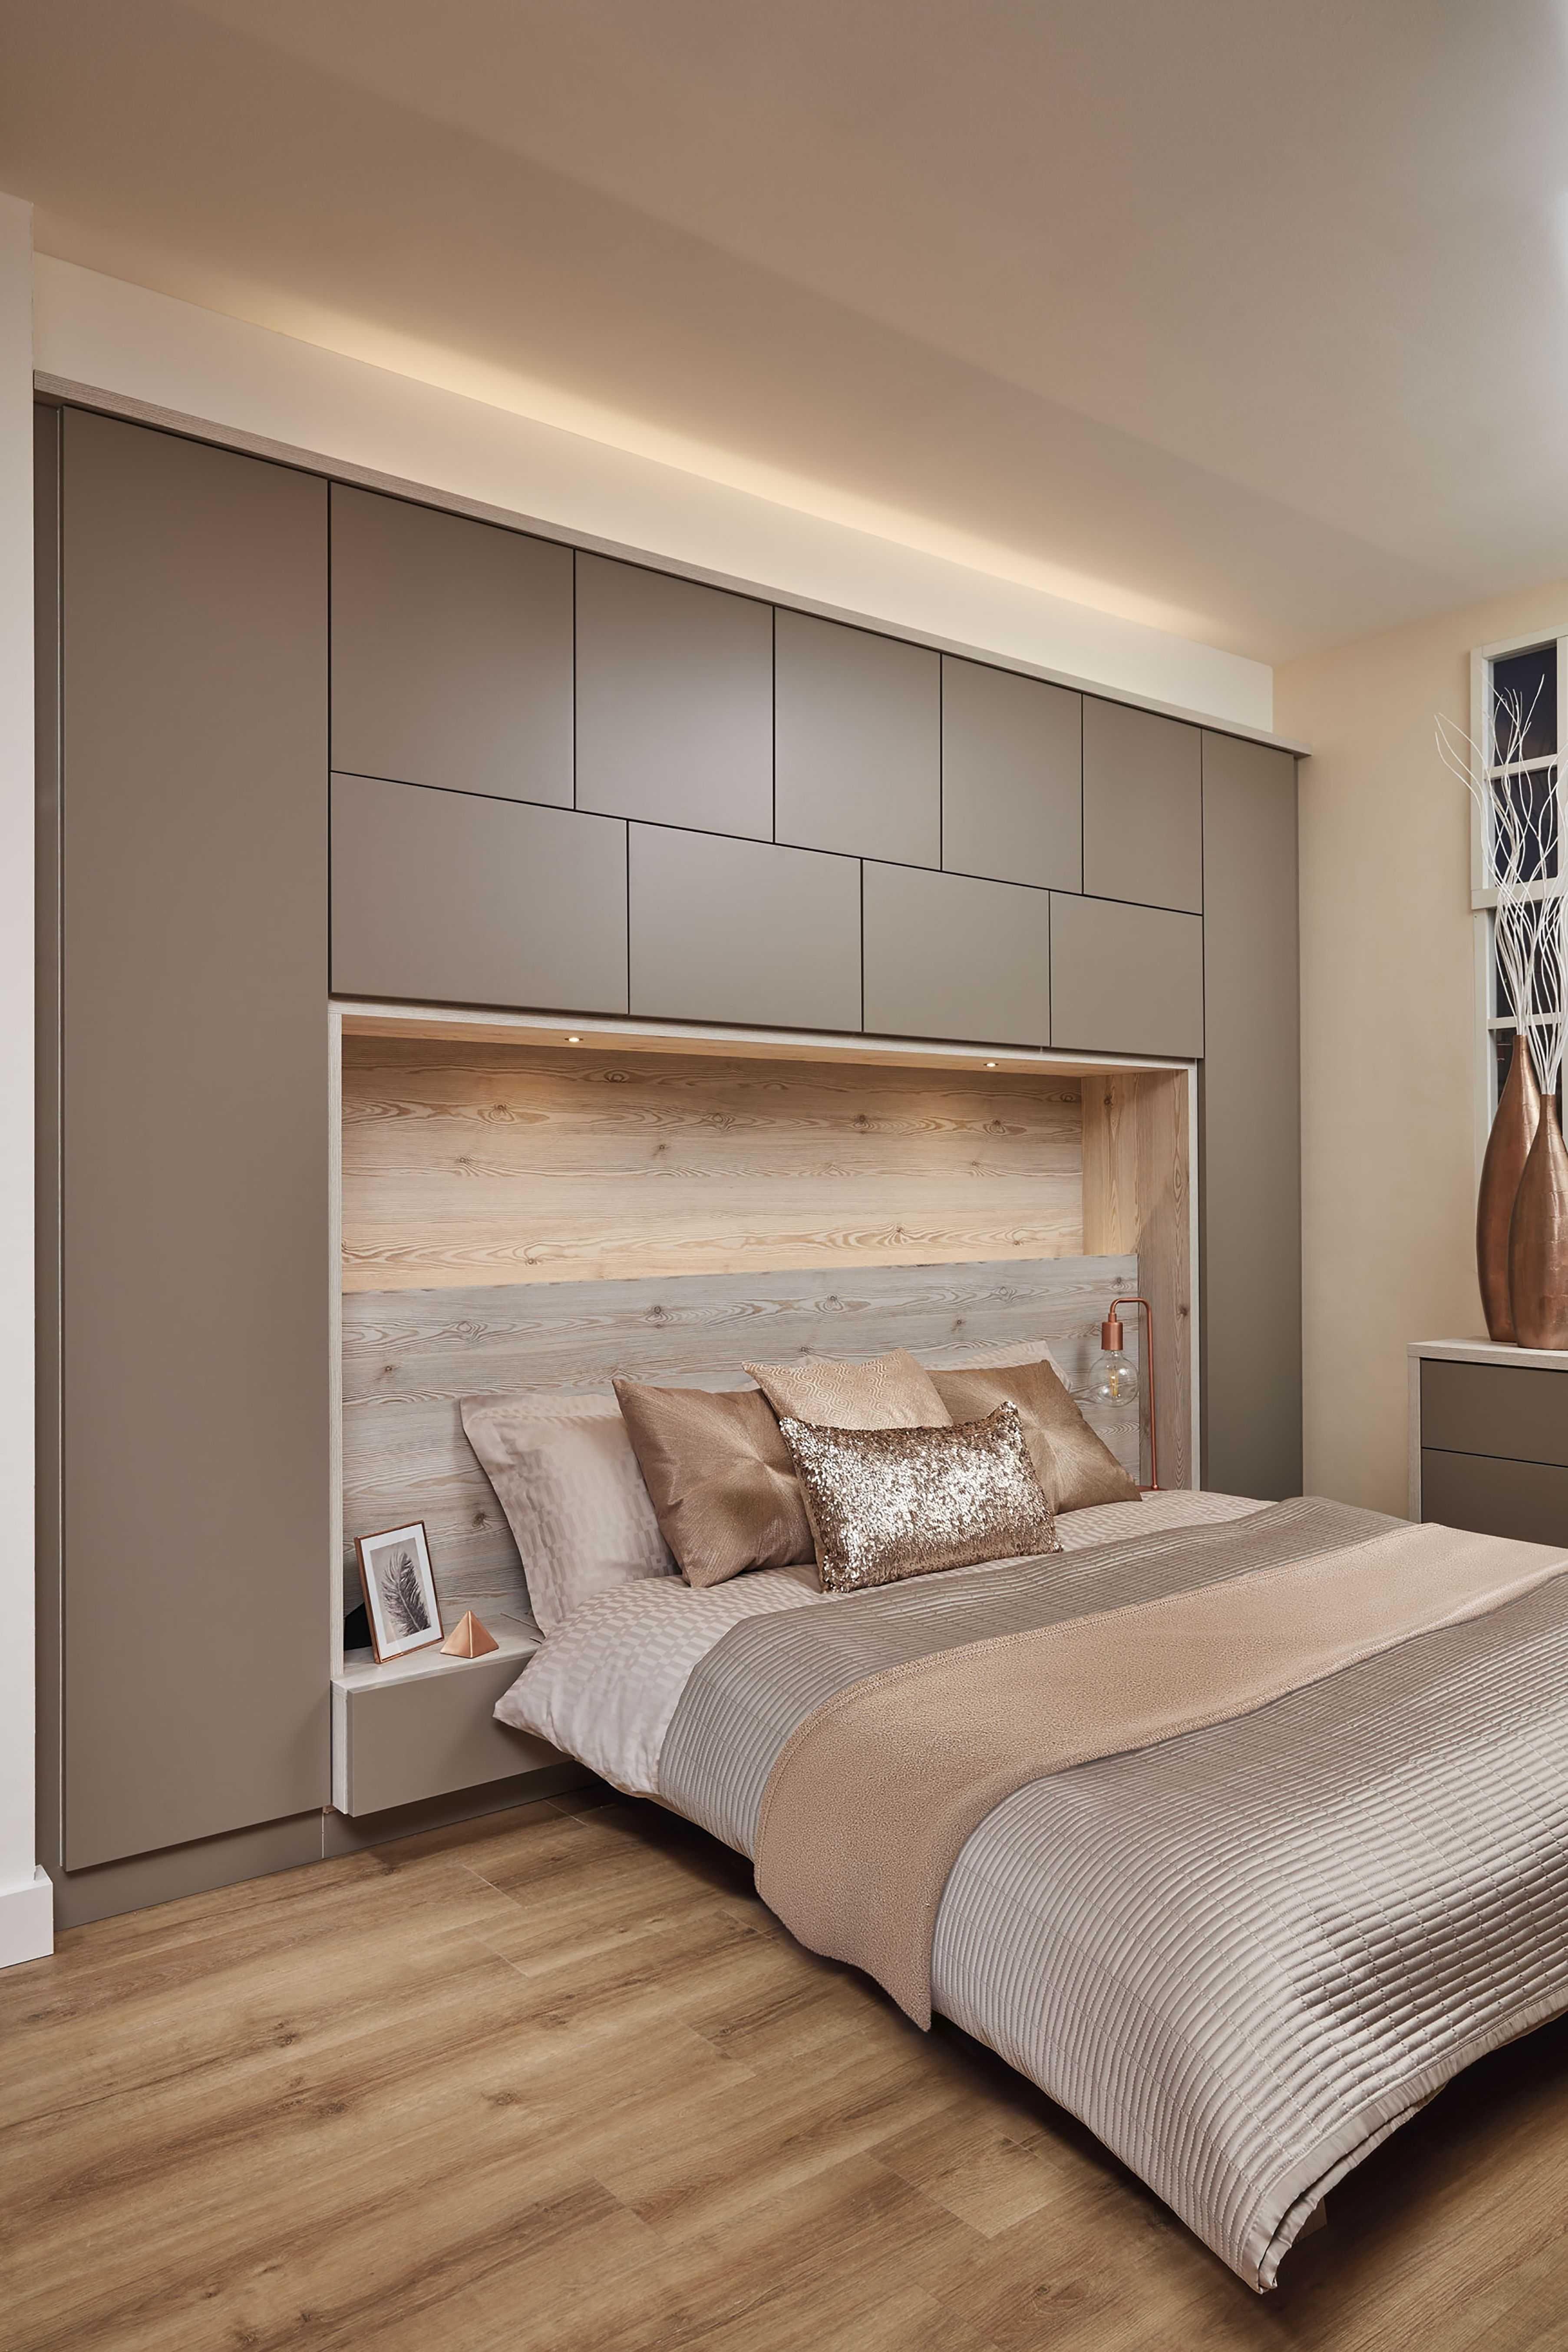 Modern Master Bedroom Storage Ideas - New Modern Master Bedroom